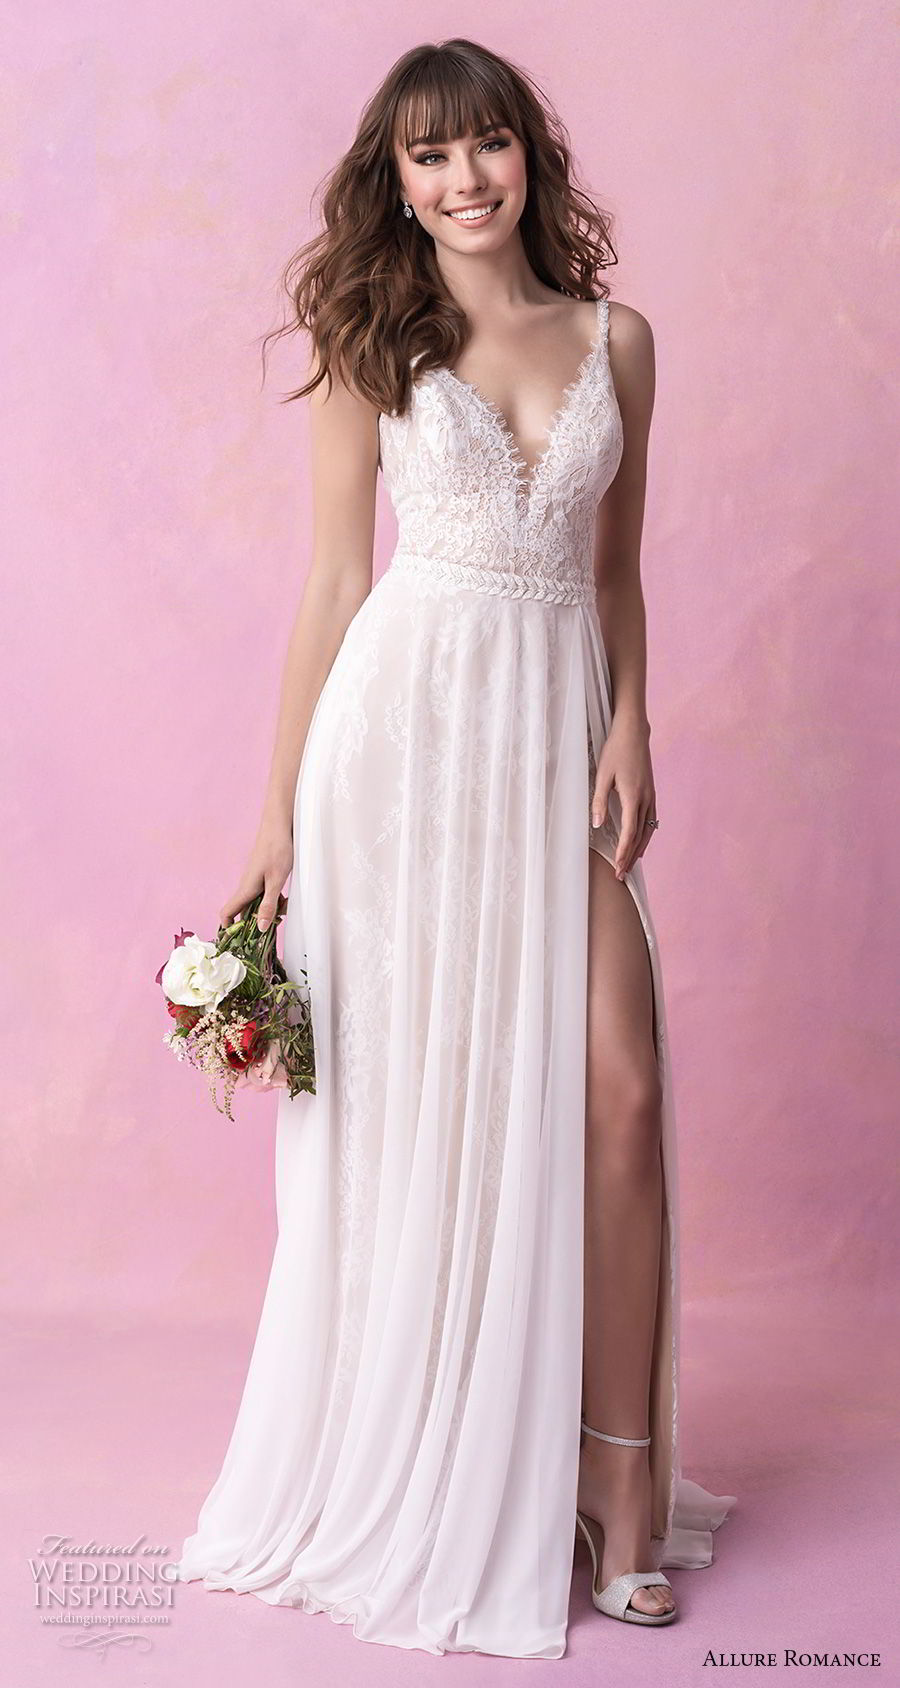 Allure Romance Fall 2018 Wedding Dresses Wedding Inspirasi